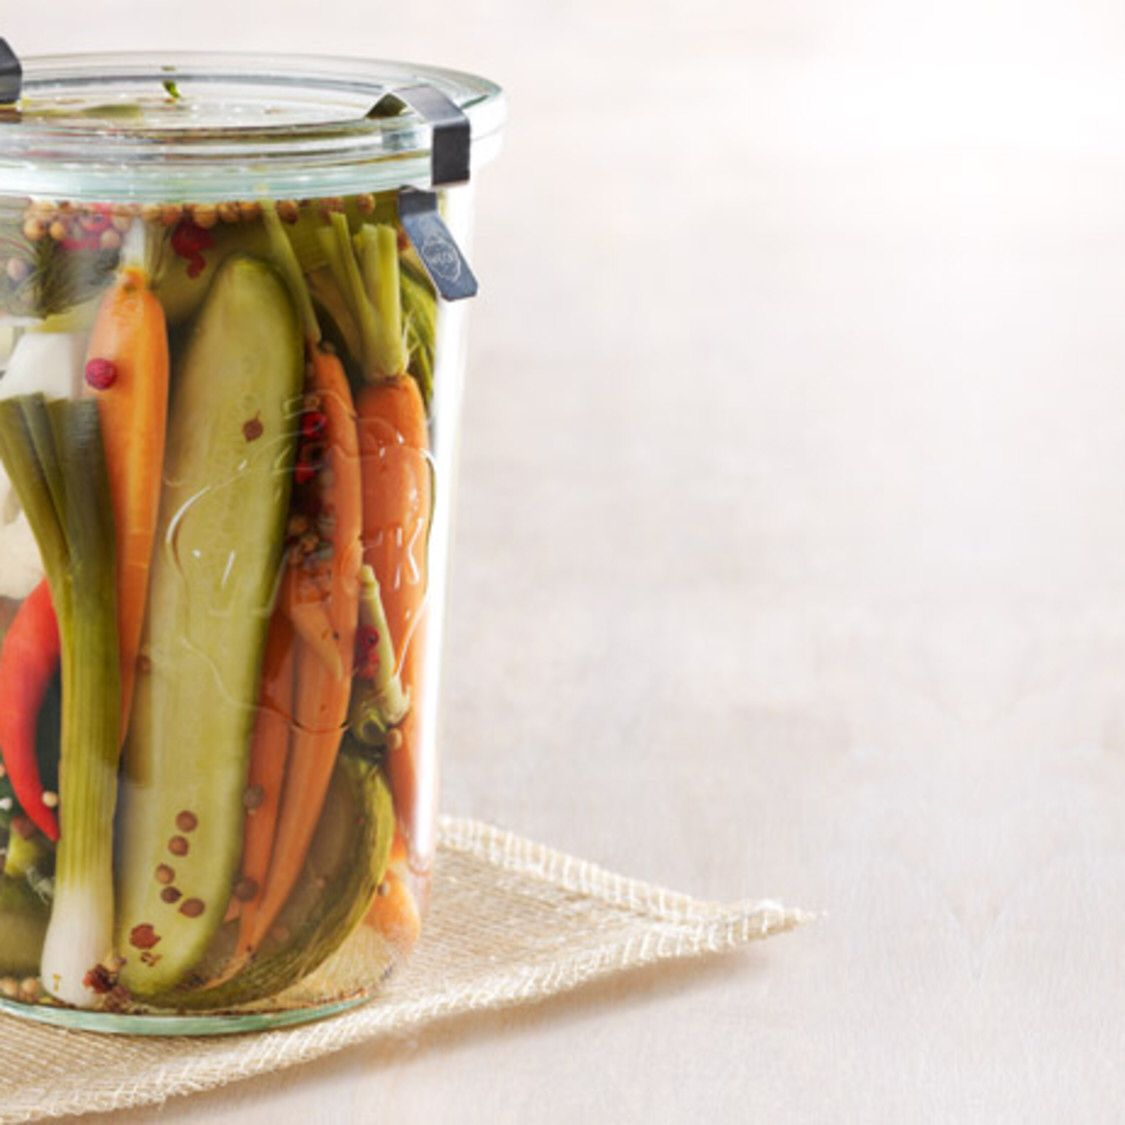 Refrigerator Pickles Cauliflower, Carrots, Cukes, You